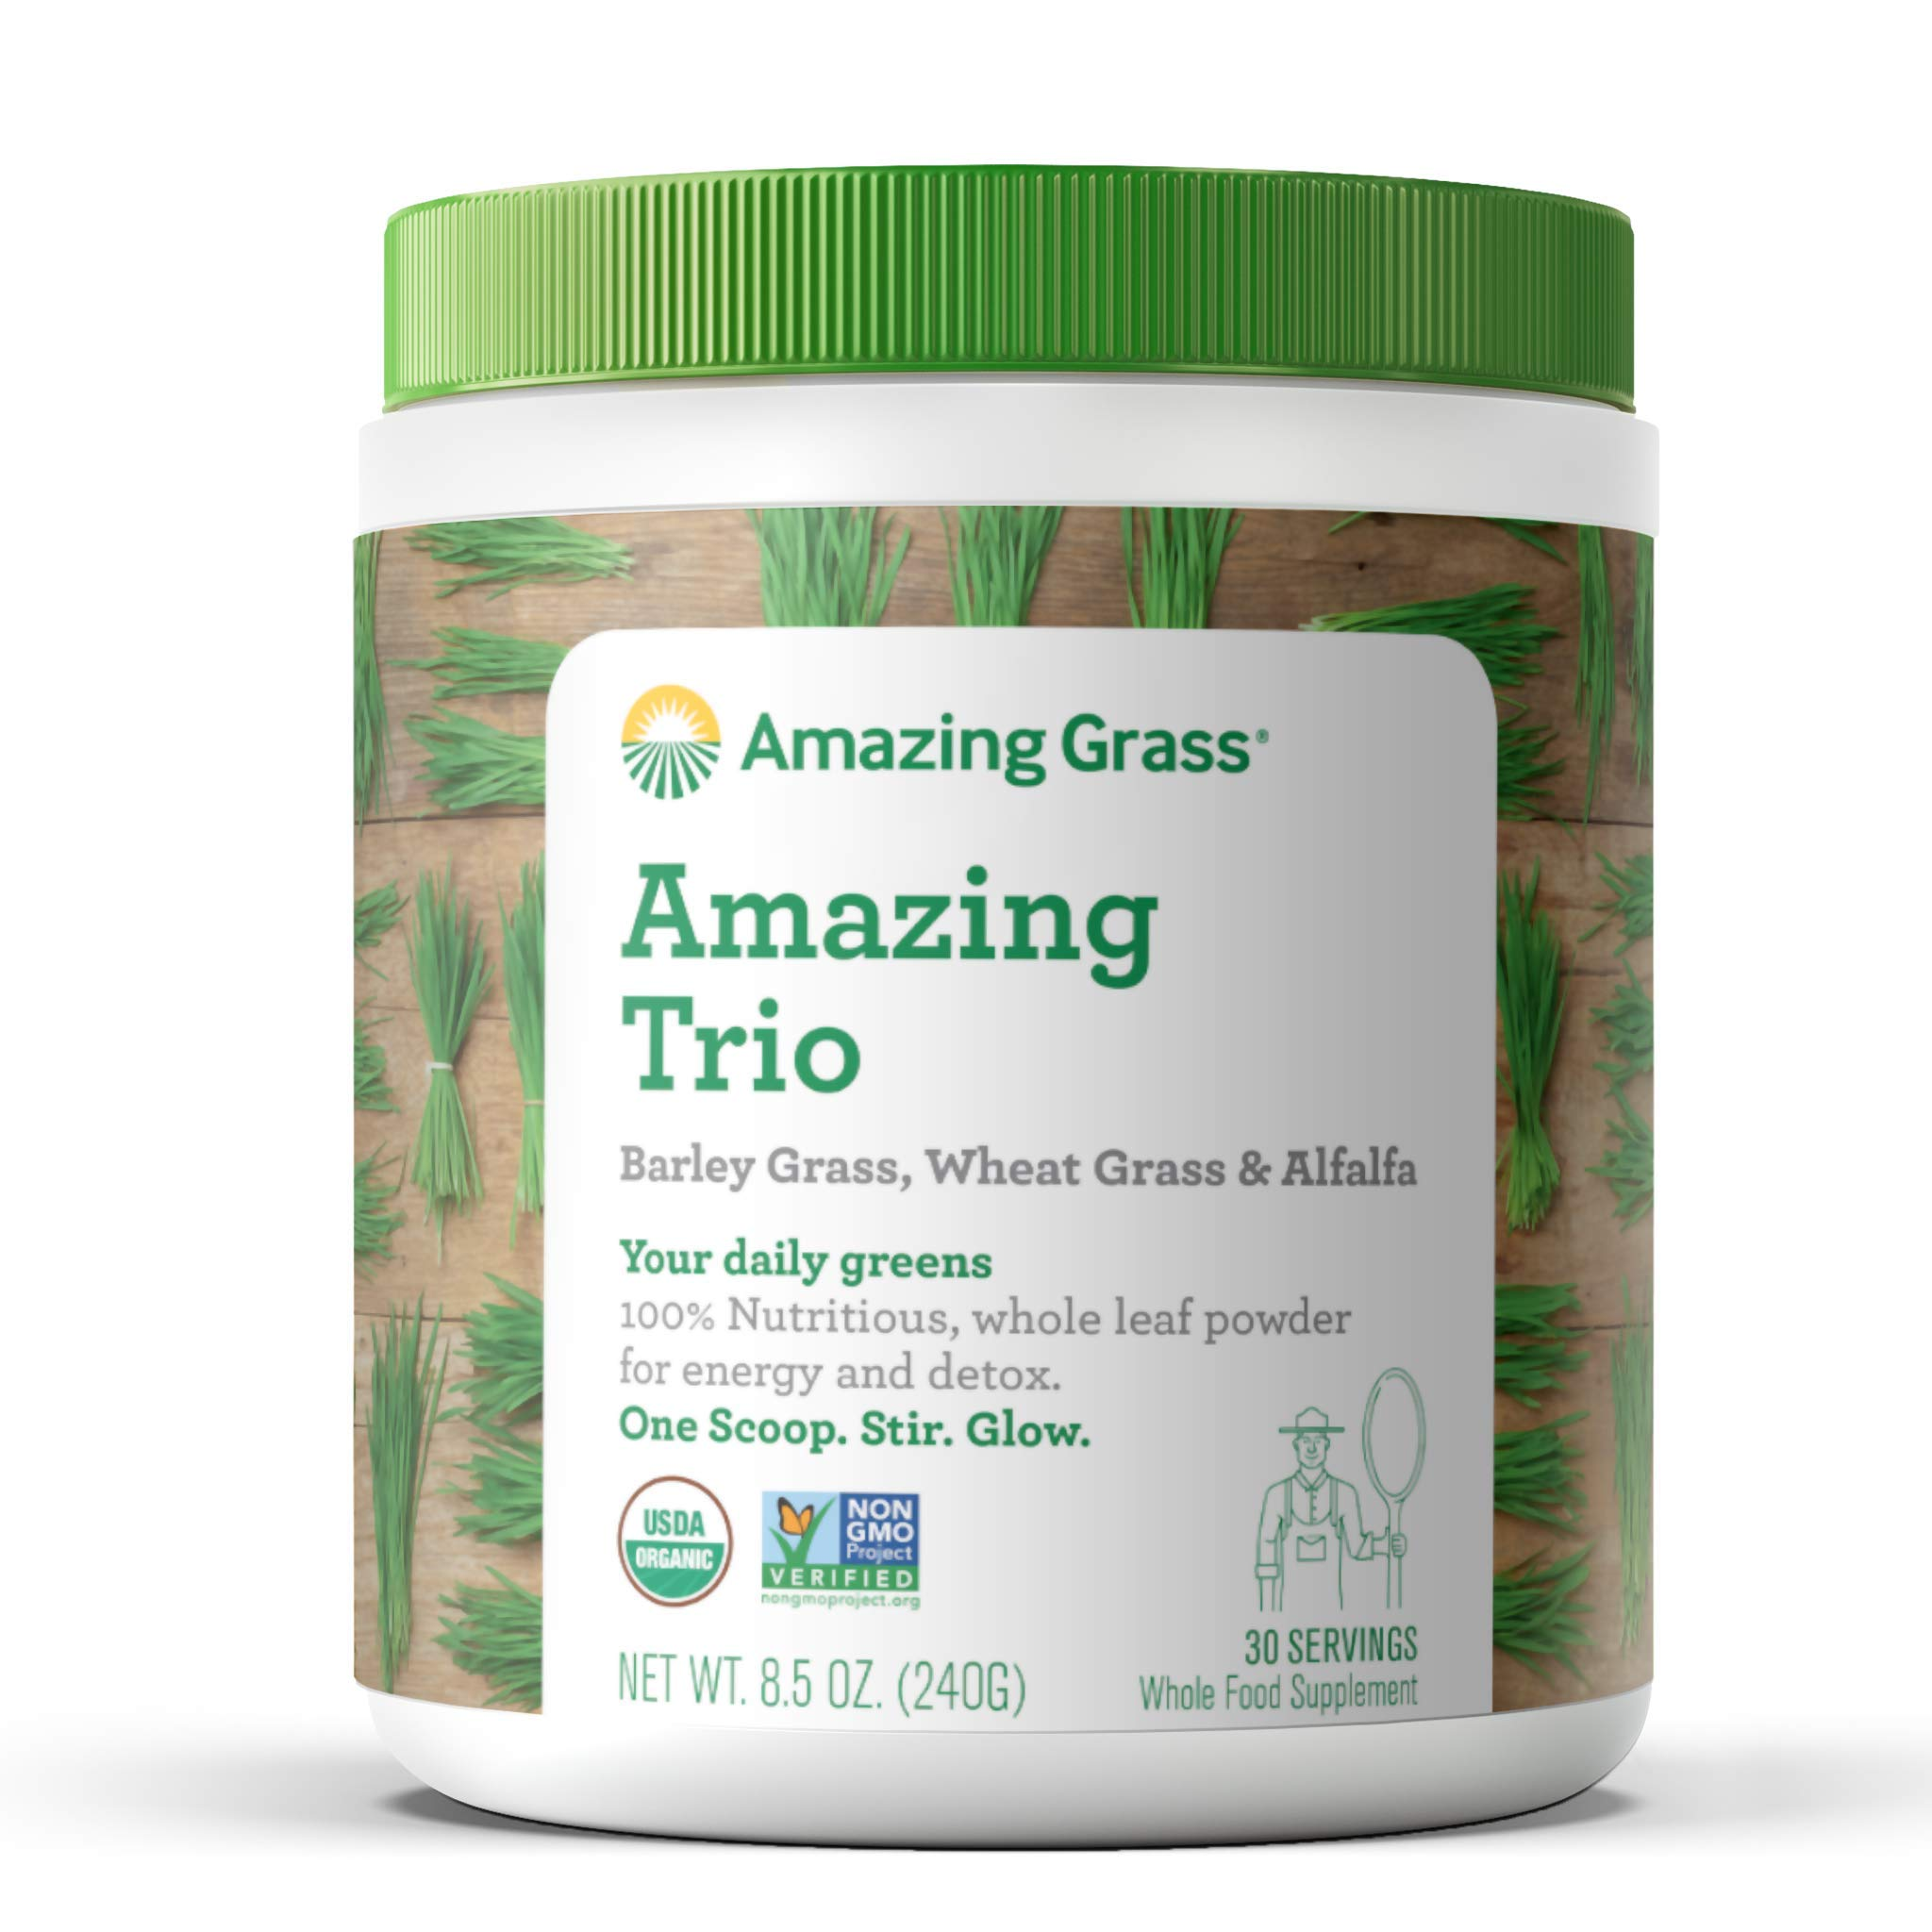 Amazing Grass Greens Trio: Greens Powder with Wheatgrass, Alfalfa, & Barley Grass, Rich Source of Chlorophyll, 30 Servings